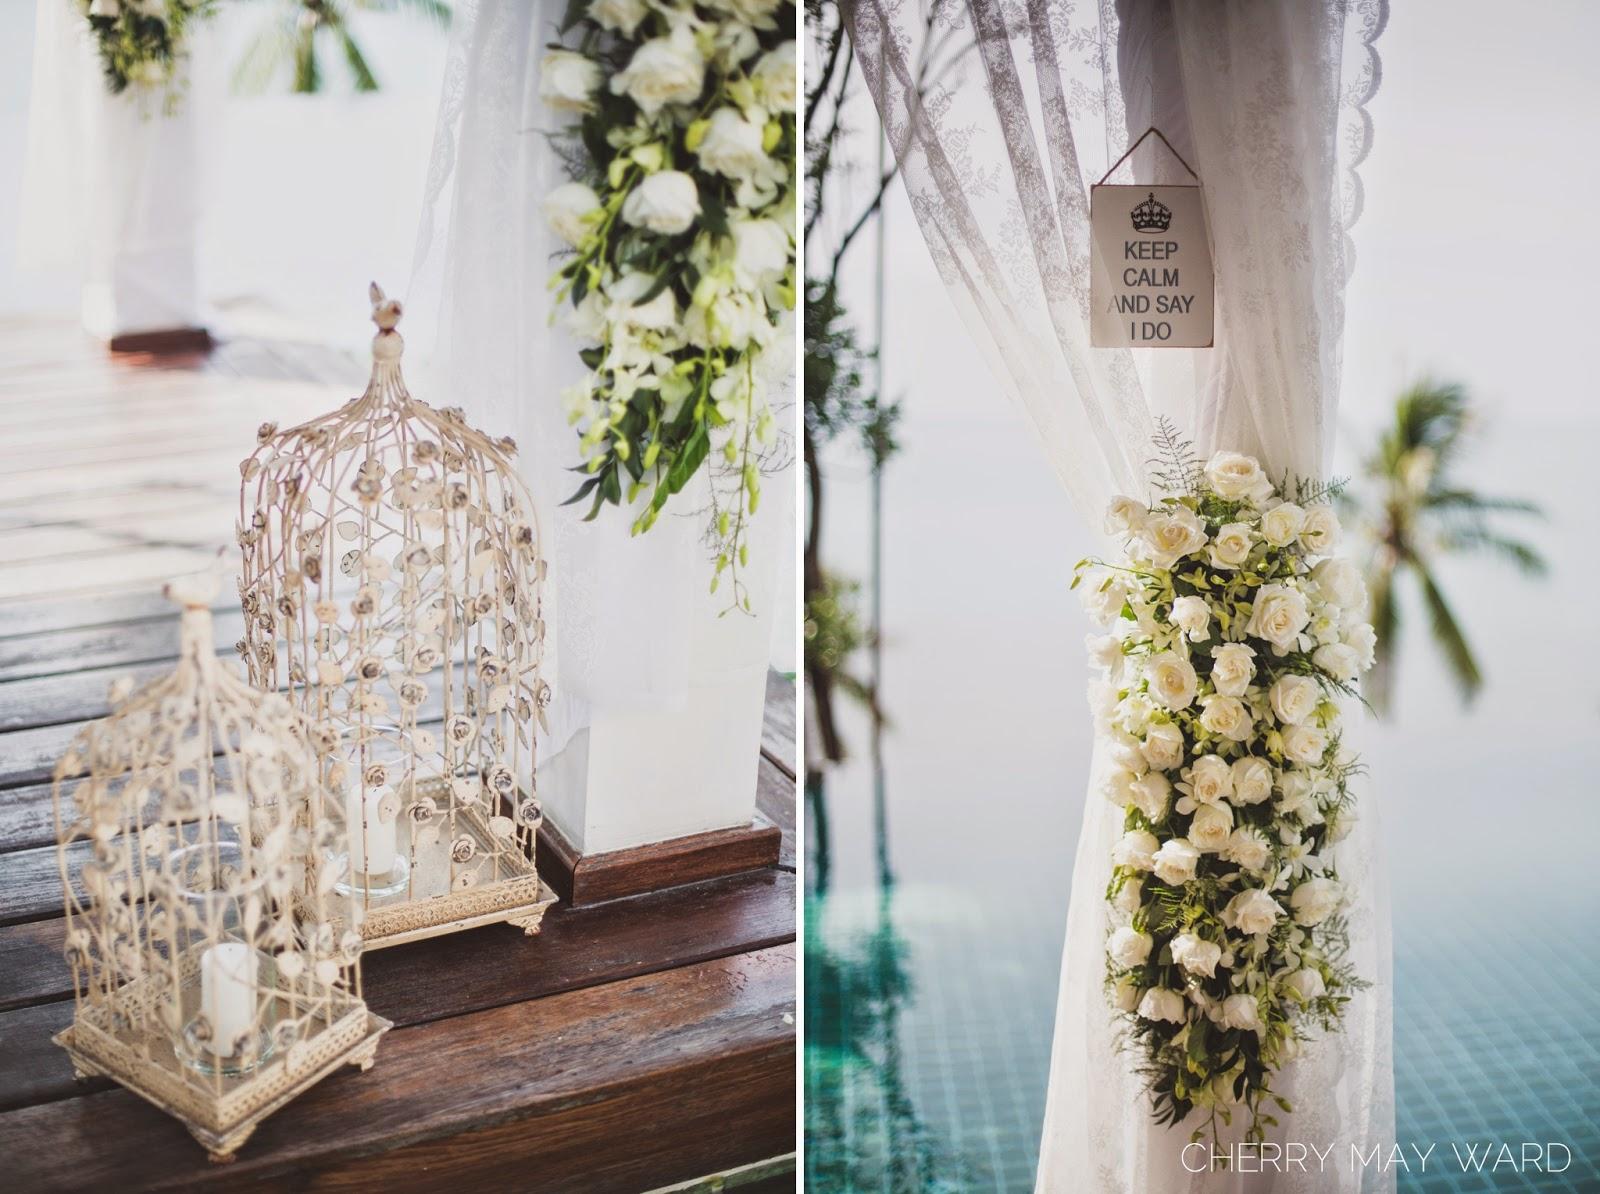 Koh Samui Villa Riva wedding details, Koh Samui white wedding, Keep Calm and Say I Do,  lanterns, white roses,